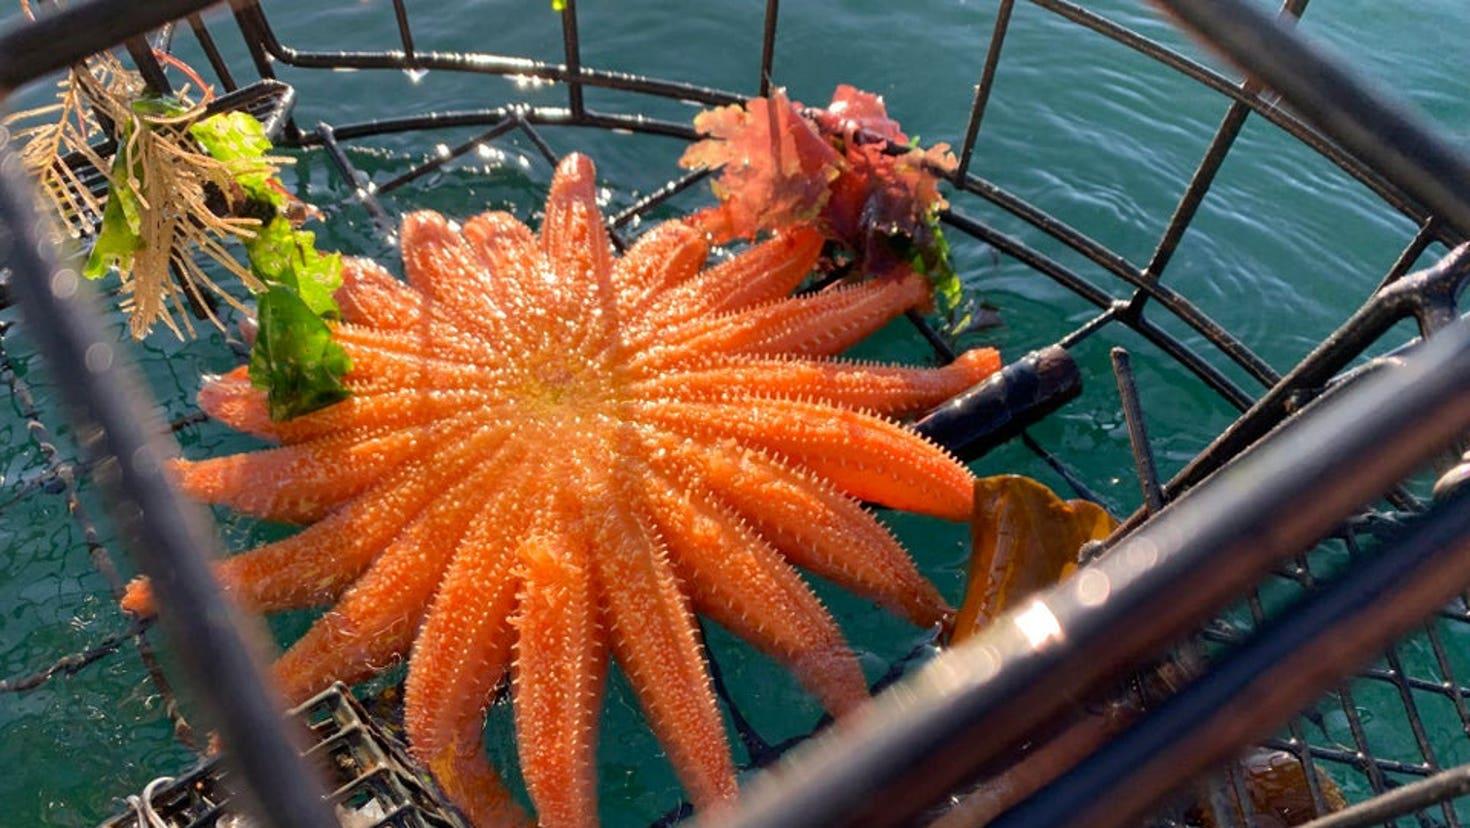 star-fish-shock-742173.jpg?ve=1&tl=1